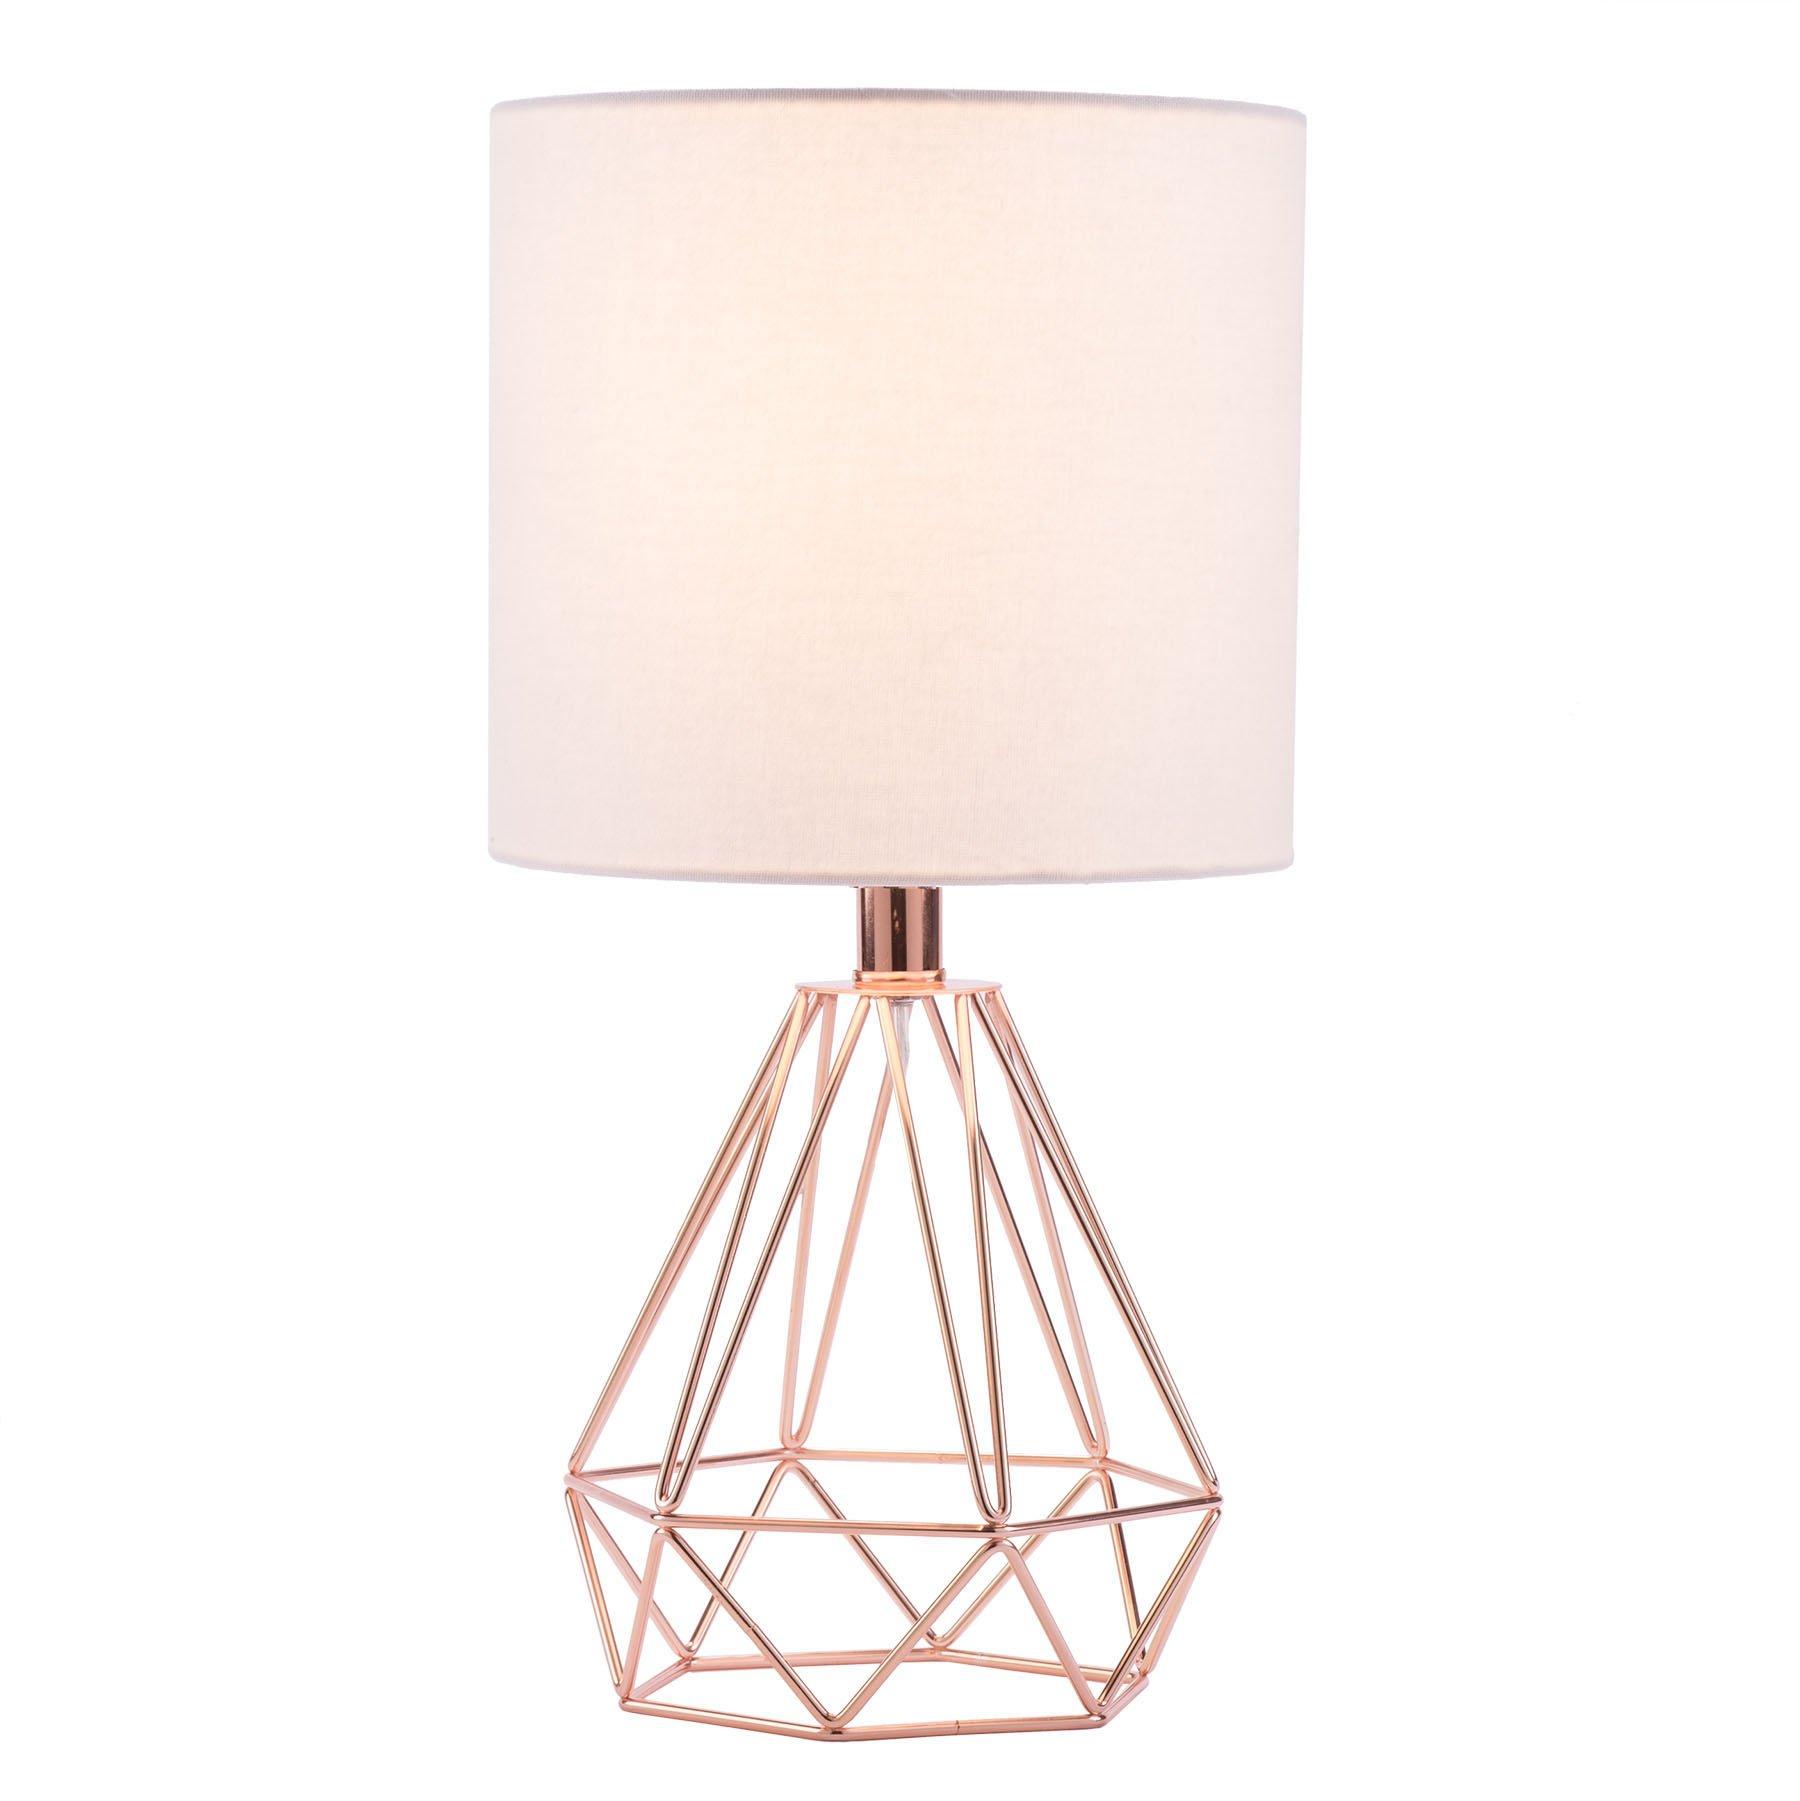 Modern Vintage Style Table Lamps Frideko Ecopower